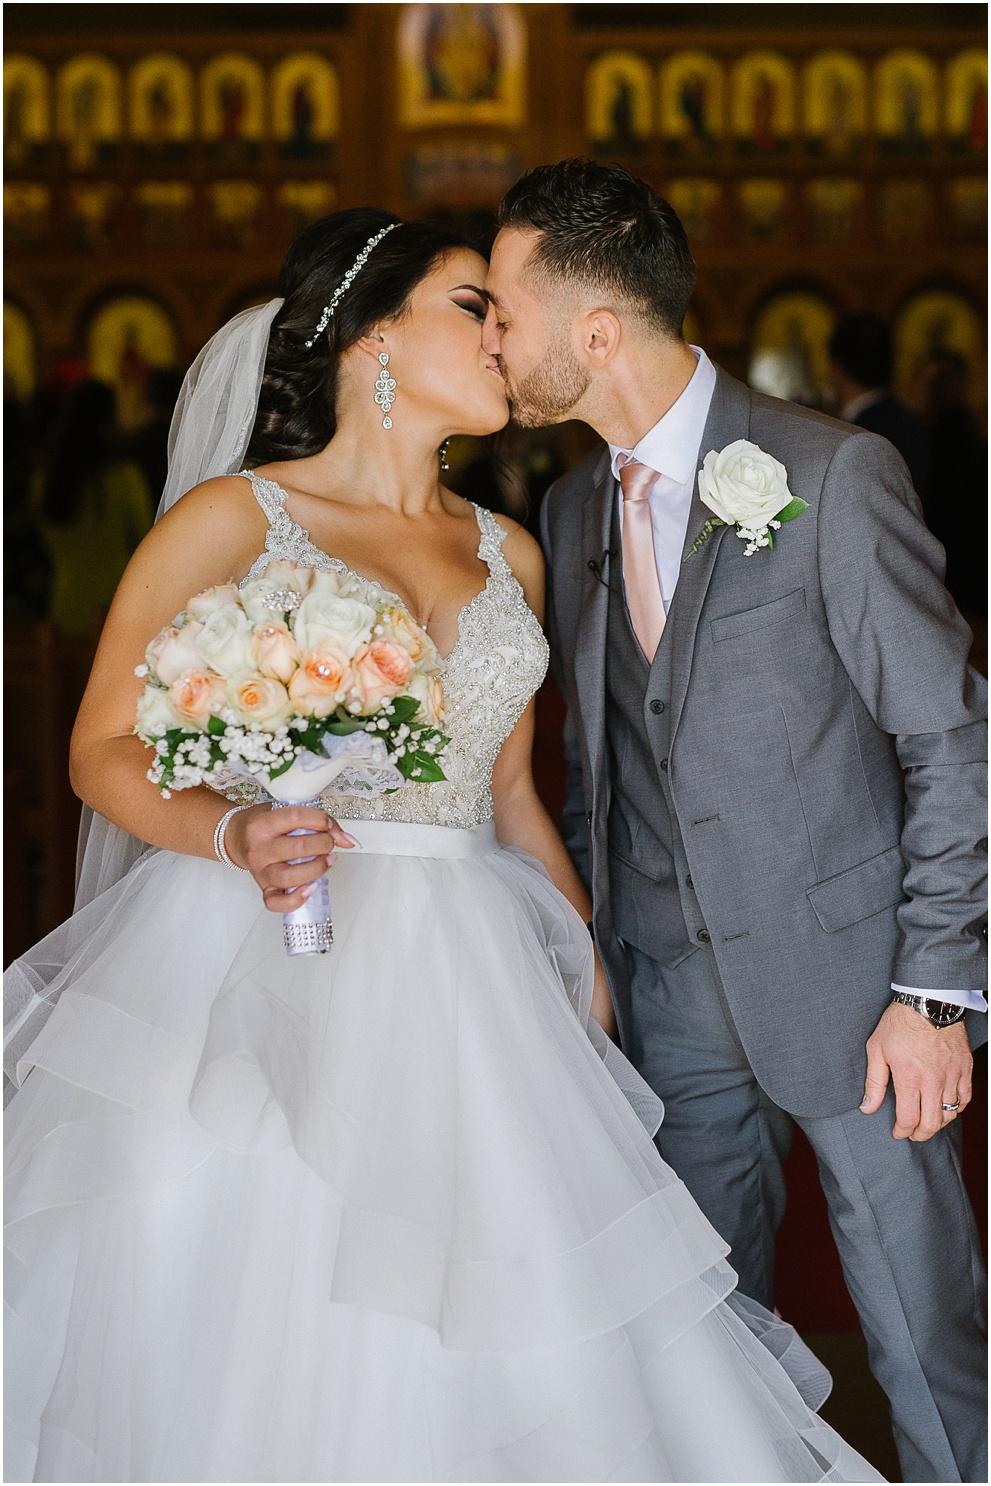 Calgary_Wedding_Photography_Nicole_Nasib_2017_Blog_0029.jpg